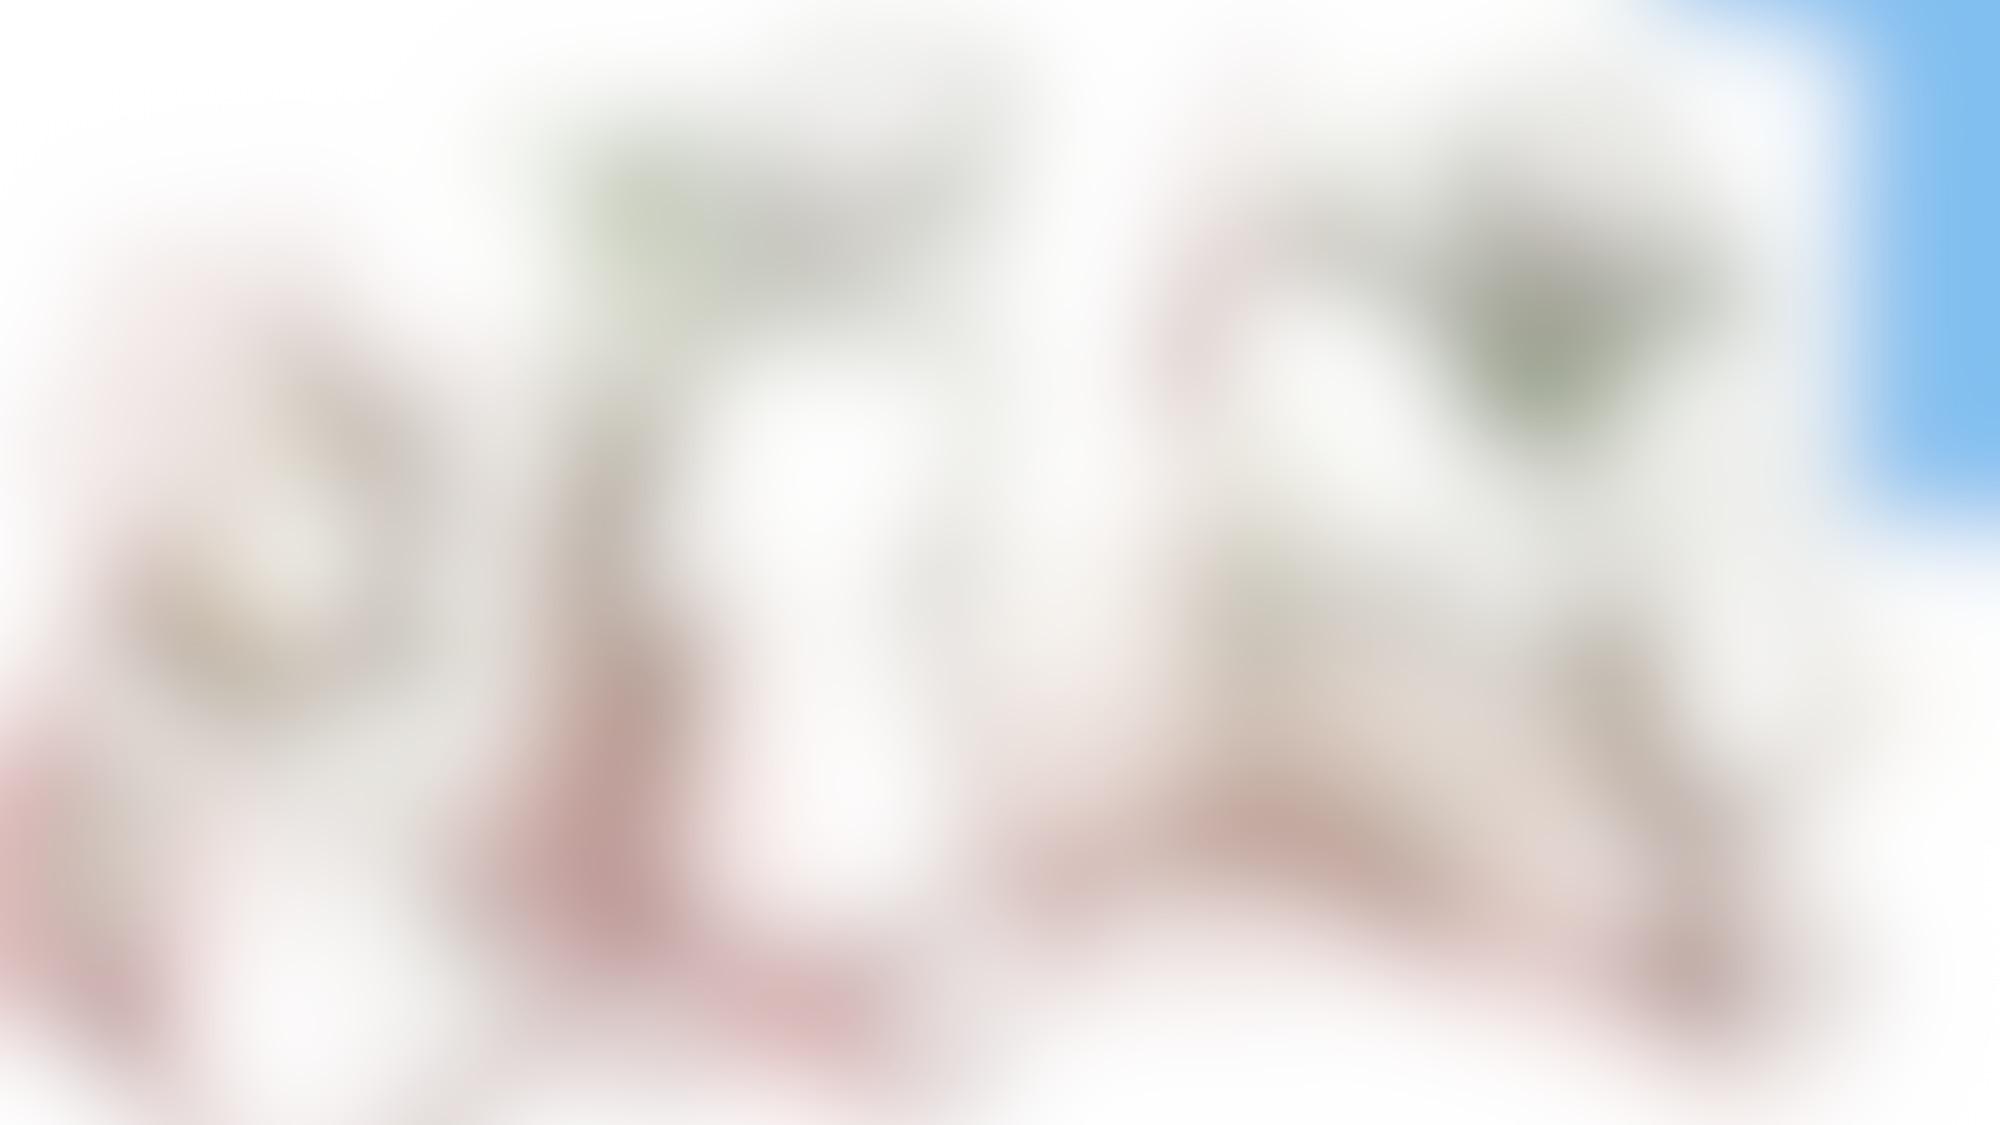 Li P mcd02 autocompressfitresizeixlibphp 1 1 0max h2000max w3 D2000q80s1b61d0b92c14dc15348ad747f2b3fc0d